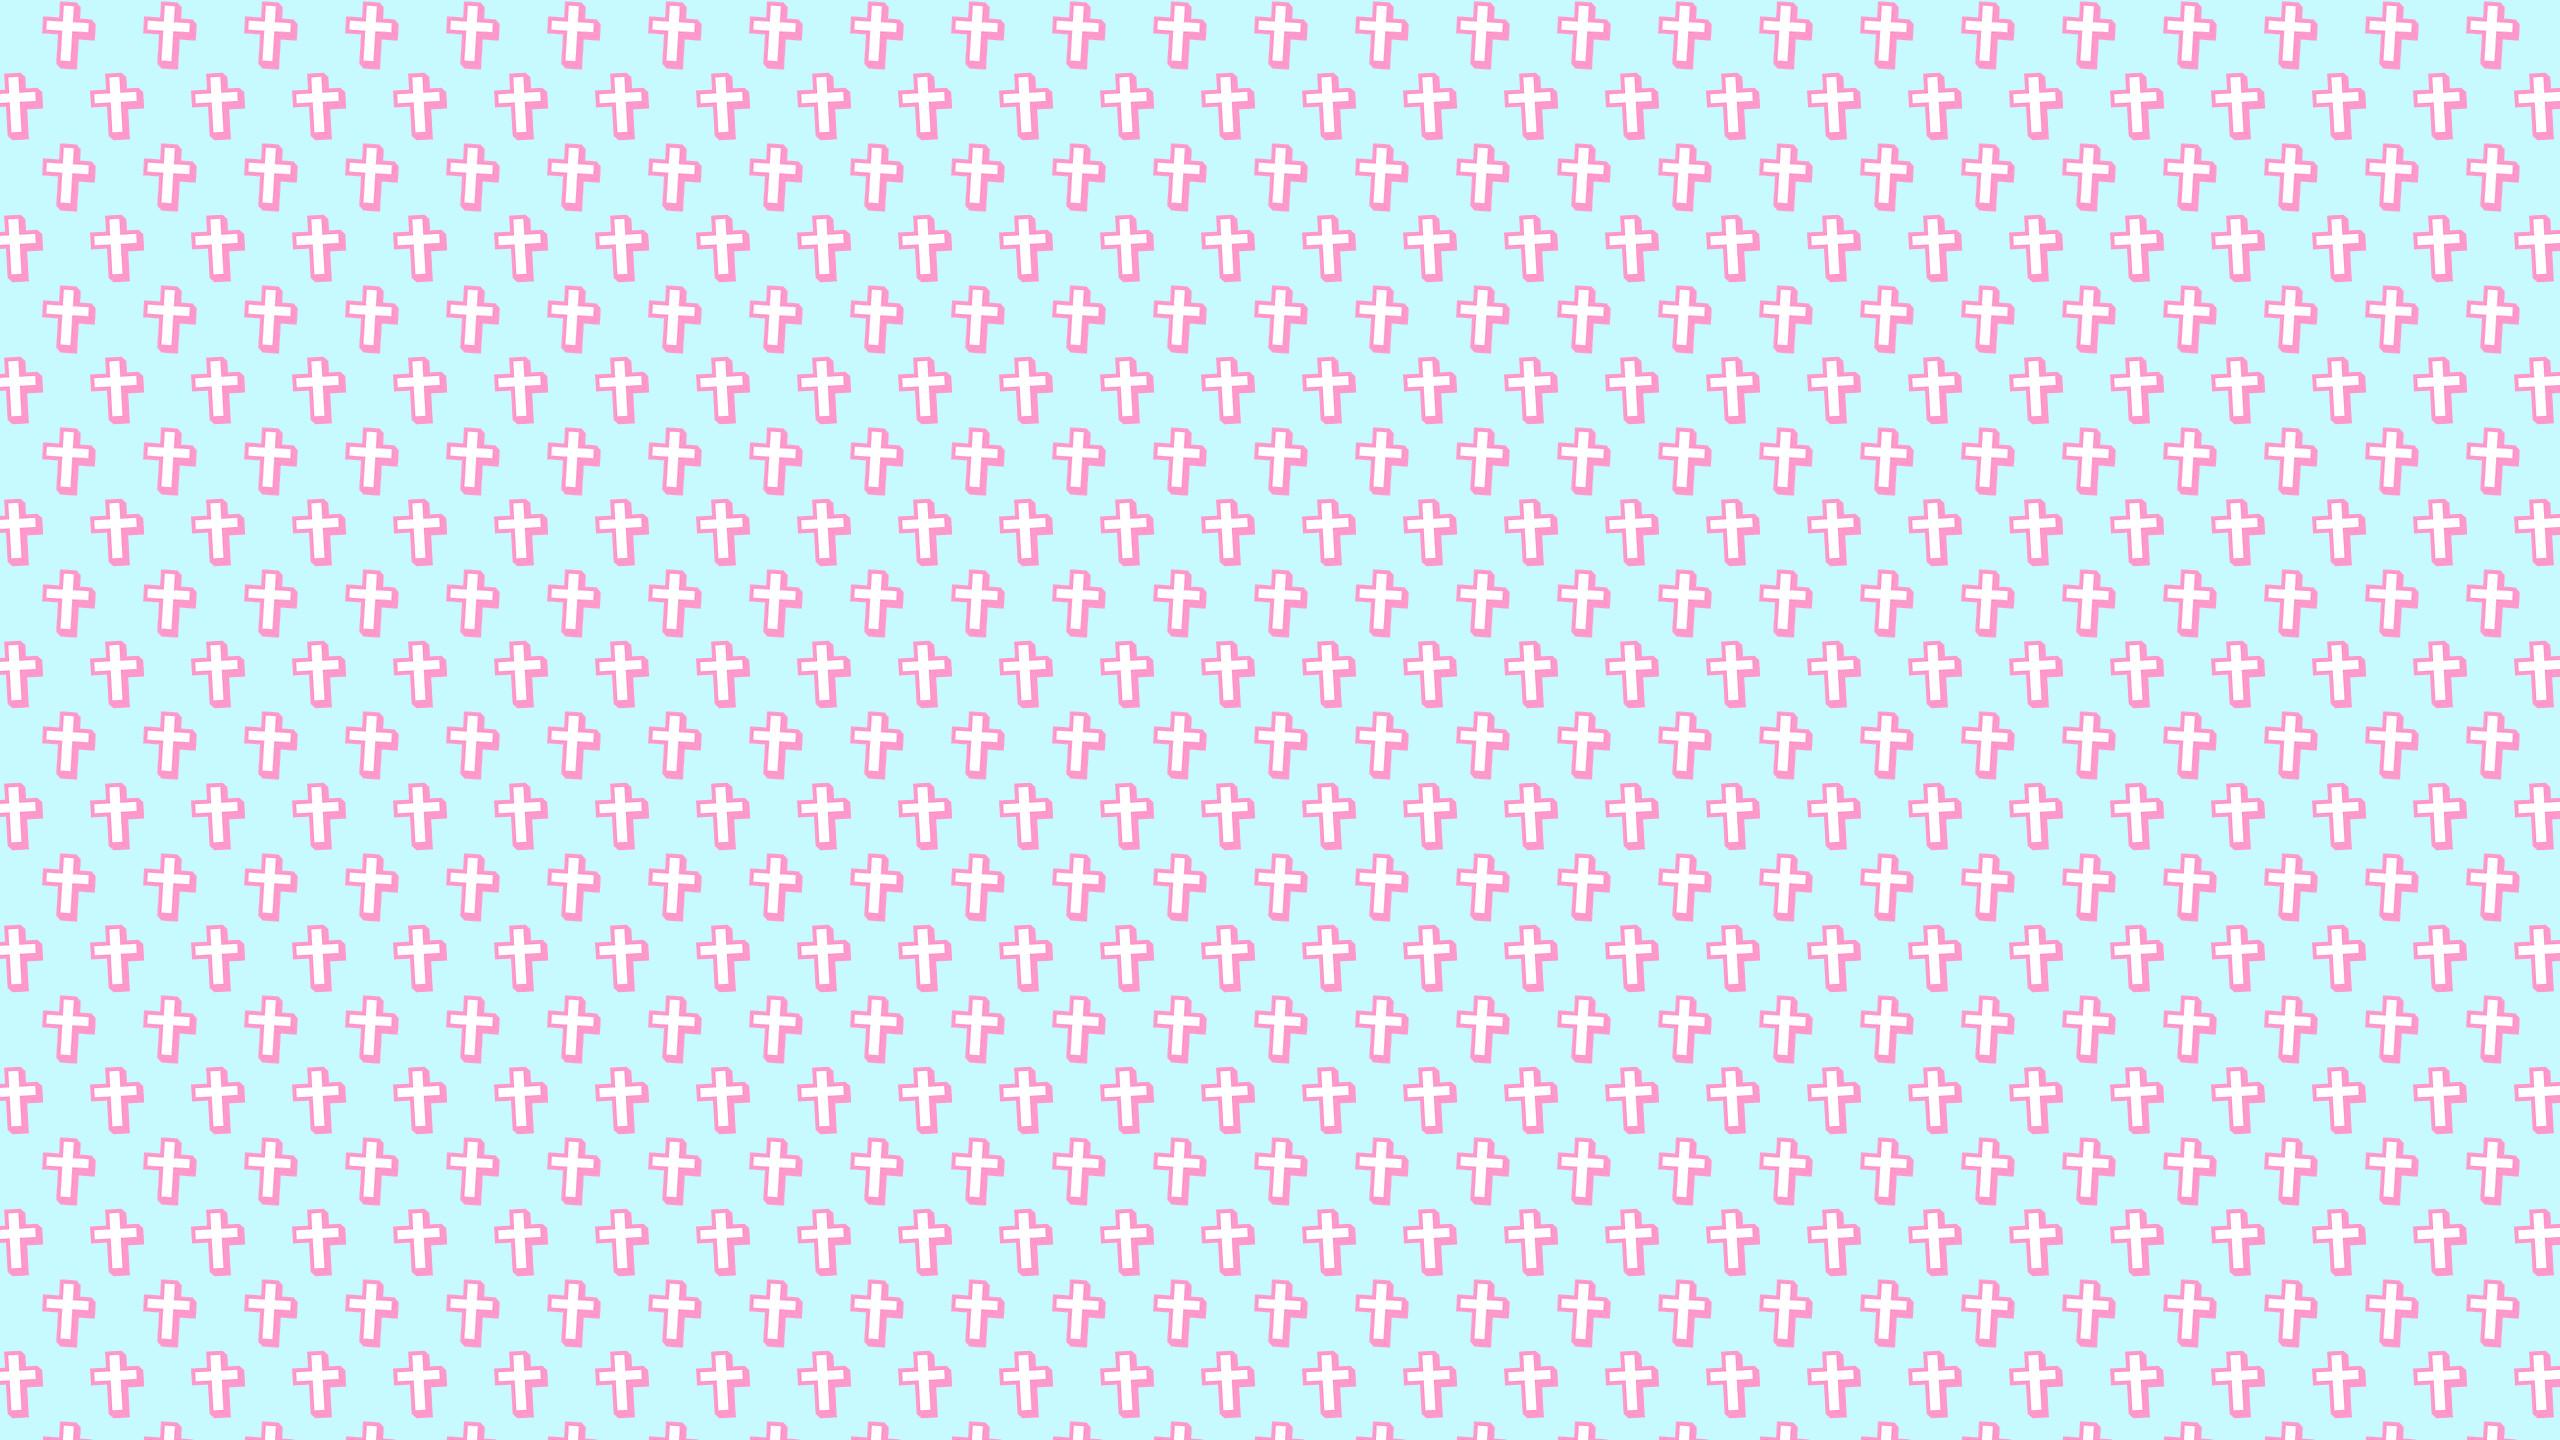 Tumblr Cute iPhone 4 Wallpaper   Cute Cute Backgrounds For .